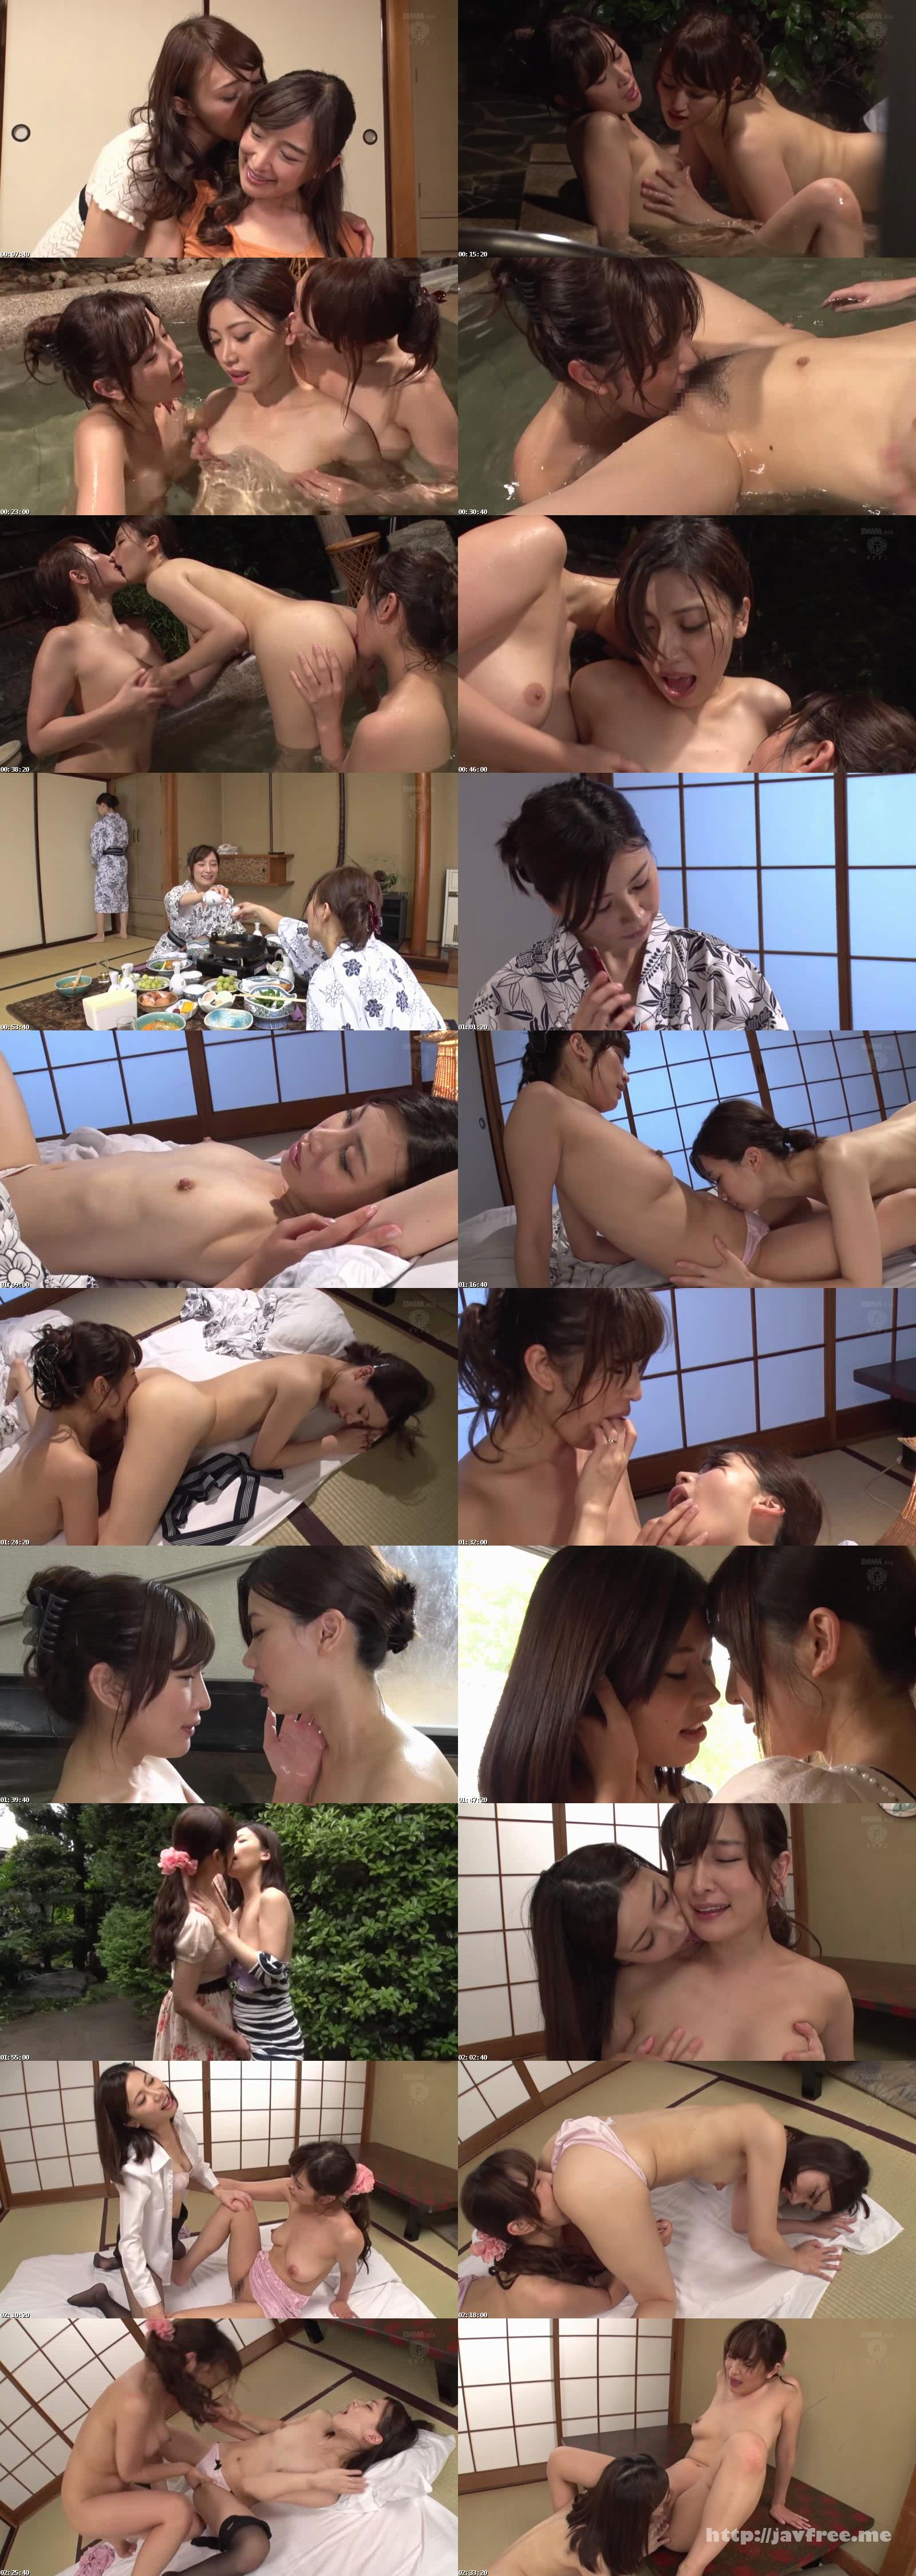 [BBAN 062] 女湯で人妻が出会ってしまったレズビアン 羽田璃子 松井優子 羽田璃子 松井優子 BBAN